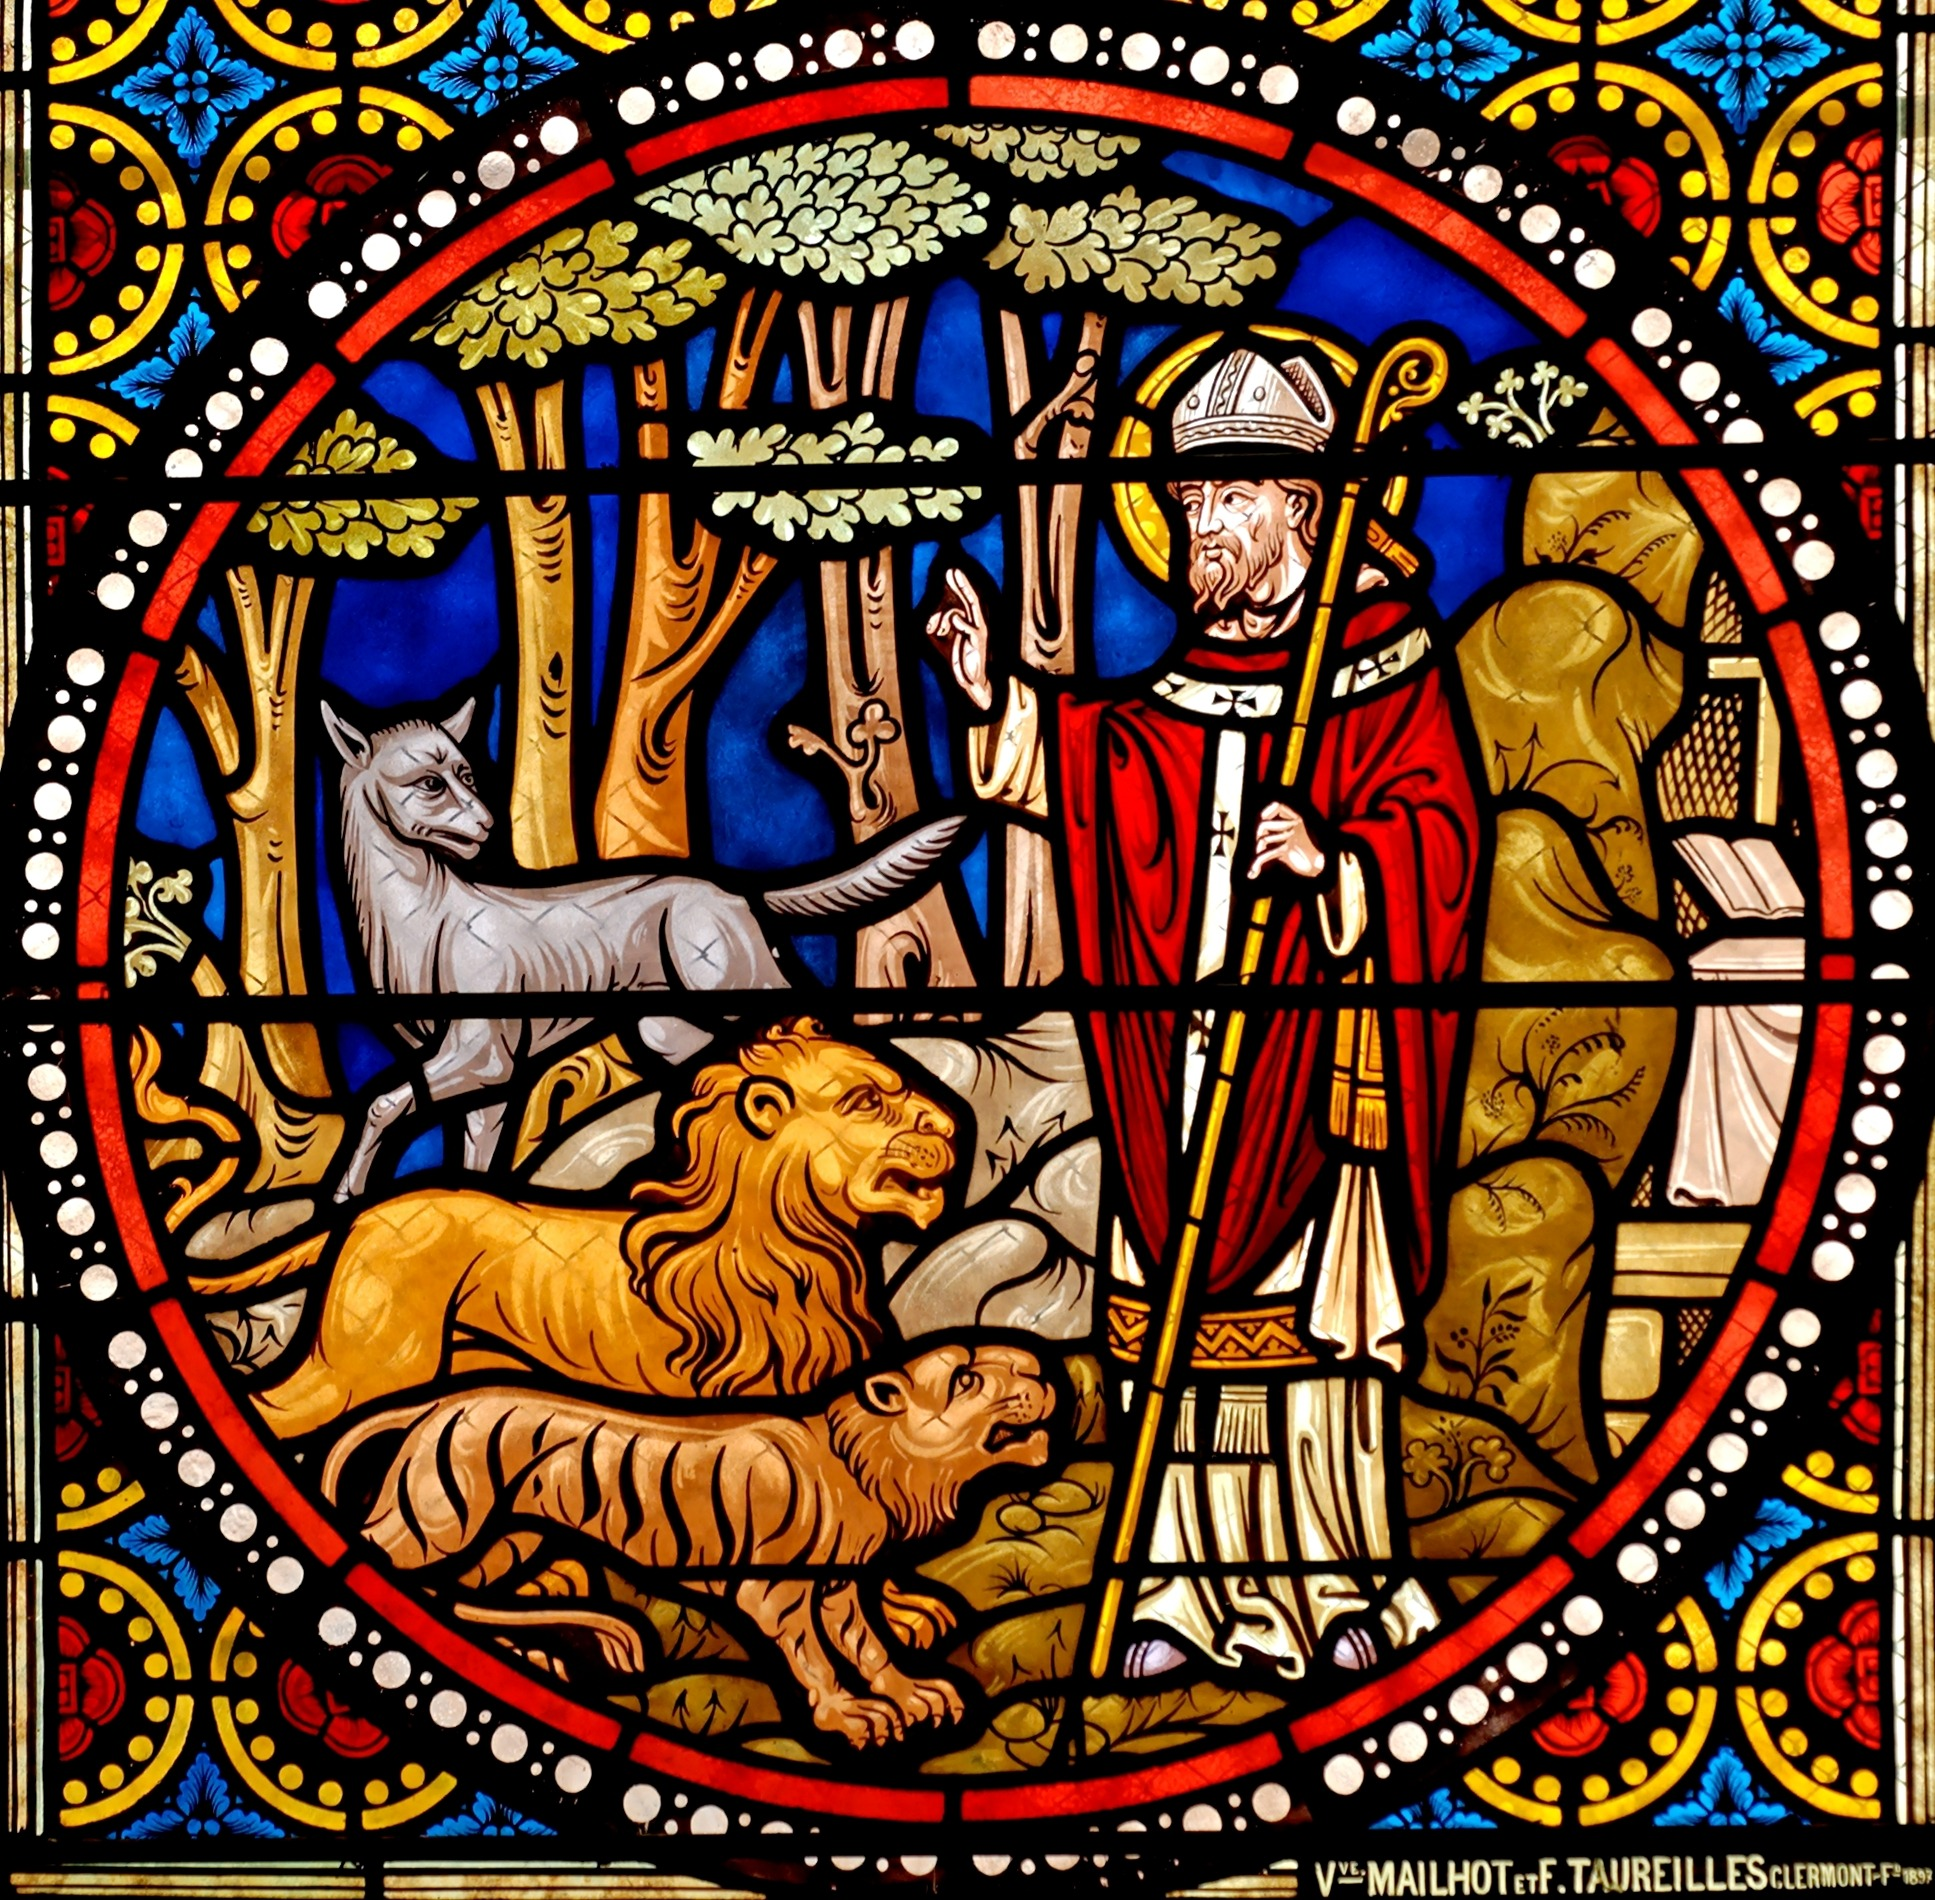 stained-glass-window-glass-st-austremonius-1897-76960.jpeg